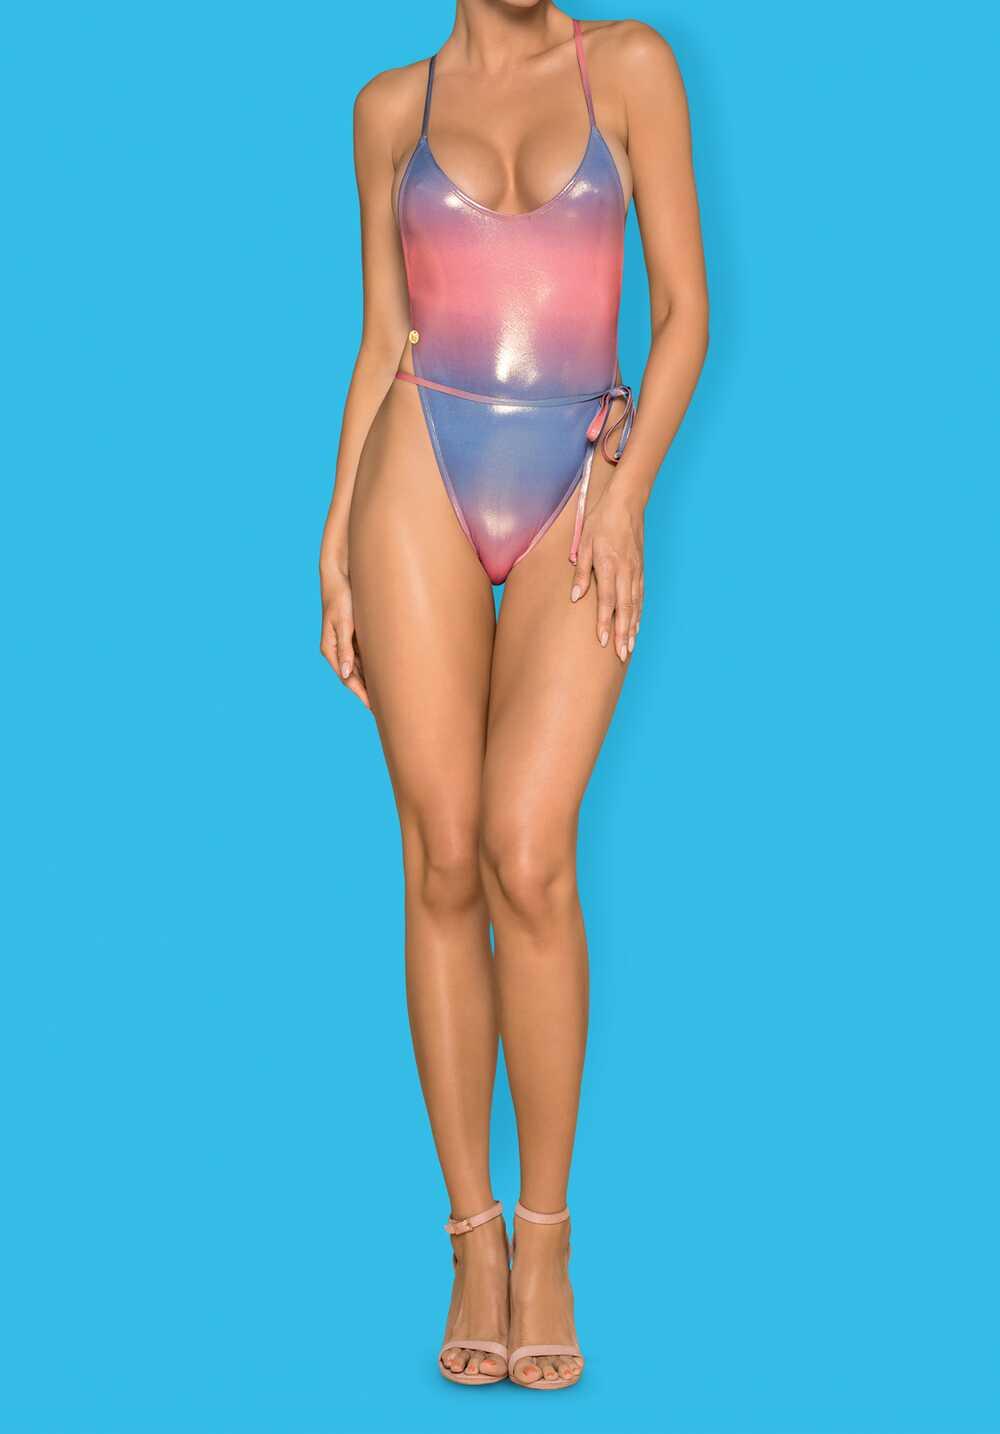 Afbeelding6 Artikel: Glowing swimsuit Variant: 1131 Parent:  Datum: 05/06/2020 17:40:09